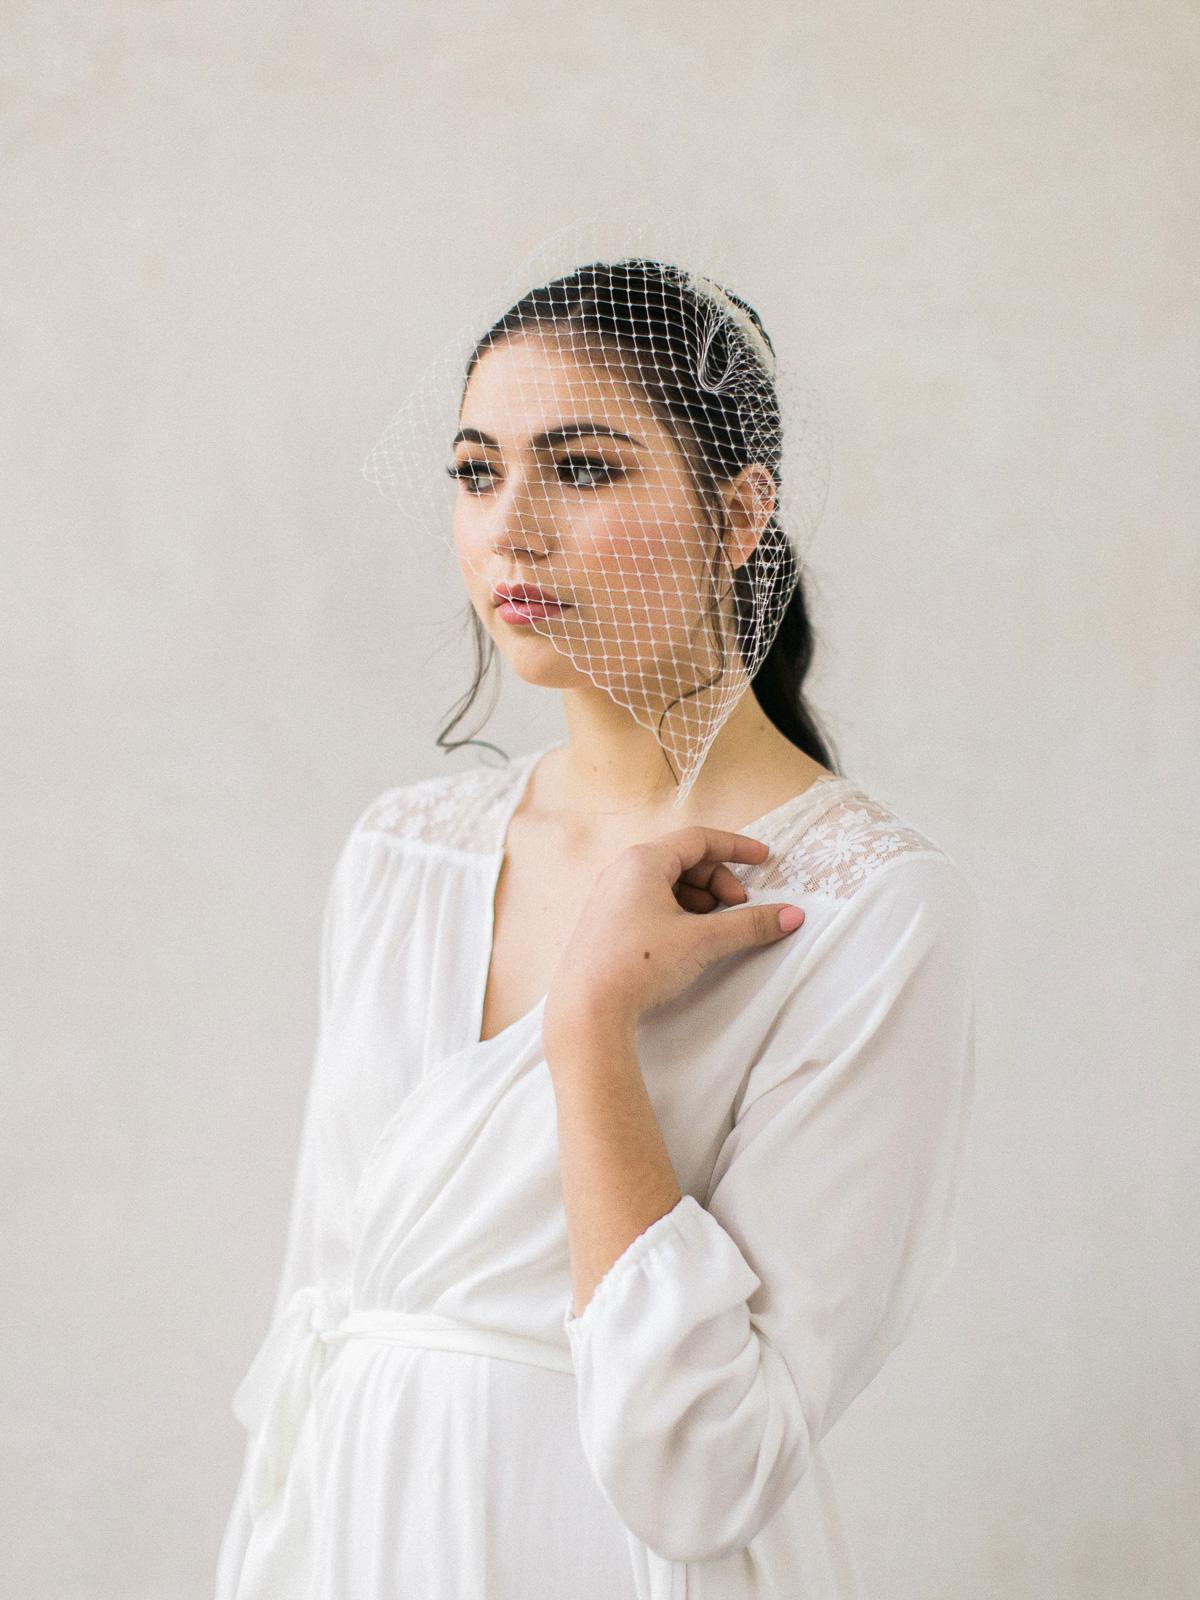 kurtz-orpia-photography-vineyard-bride-swish-list-dundurn-castle-dundas-wedding-editorial-14.jpg